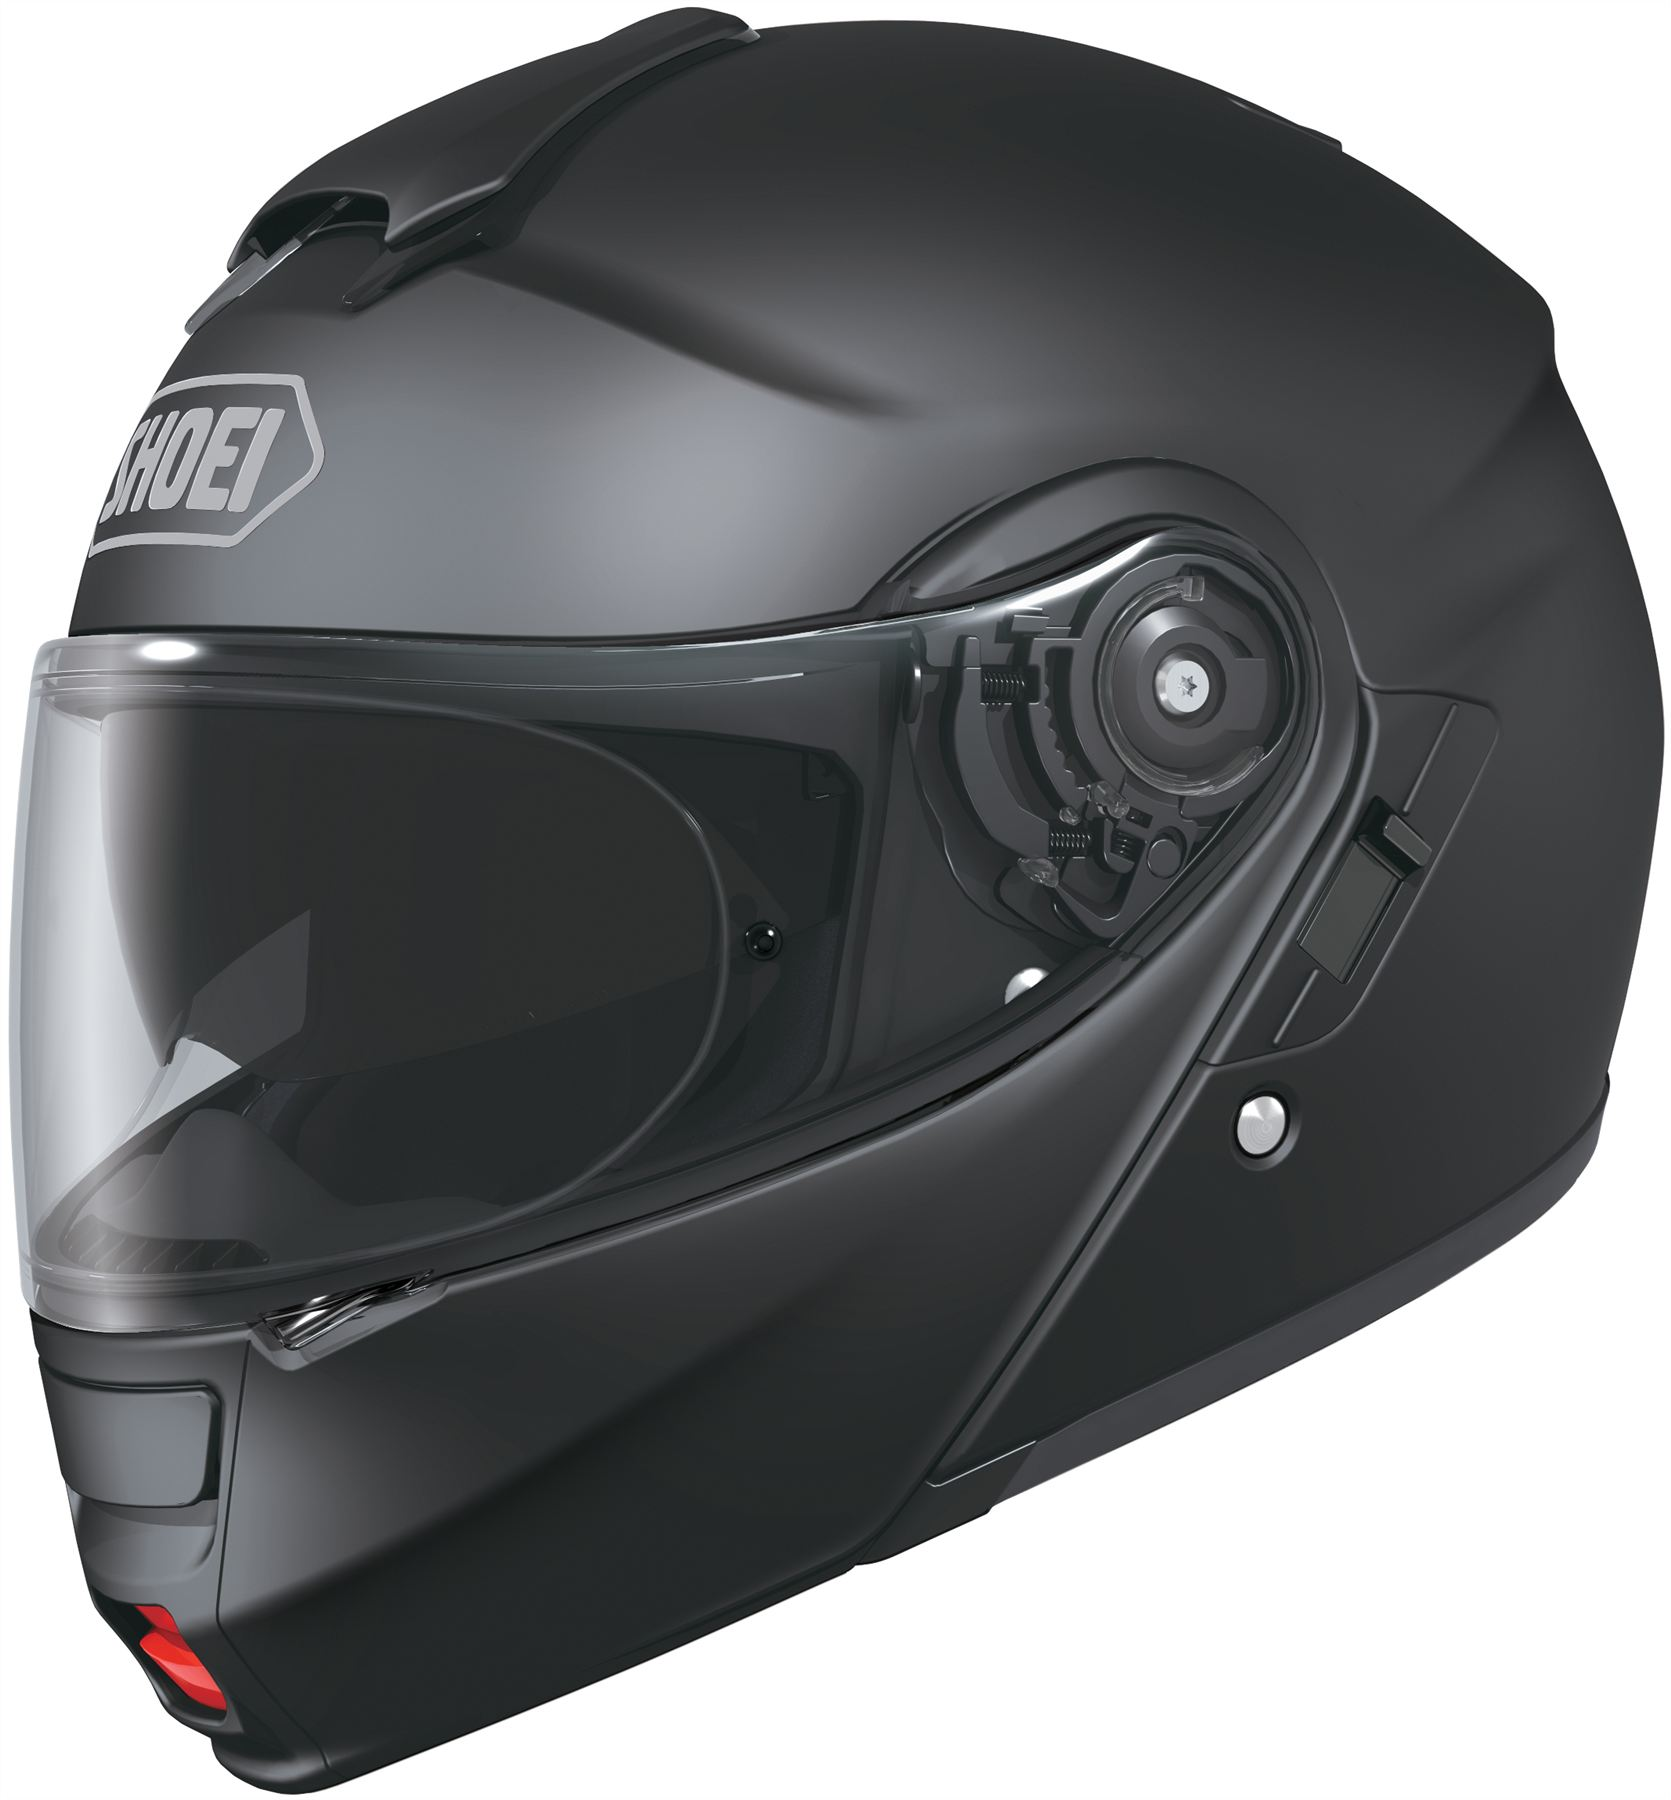 Carbon Fiber Motorcycle Helmet >> Shoei Neotec Flip Up Modular Motorcycle Helmet DOT Approved   eBay